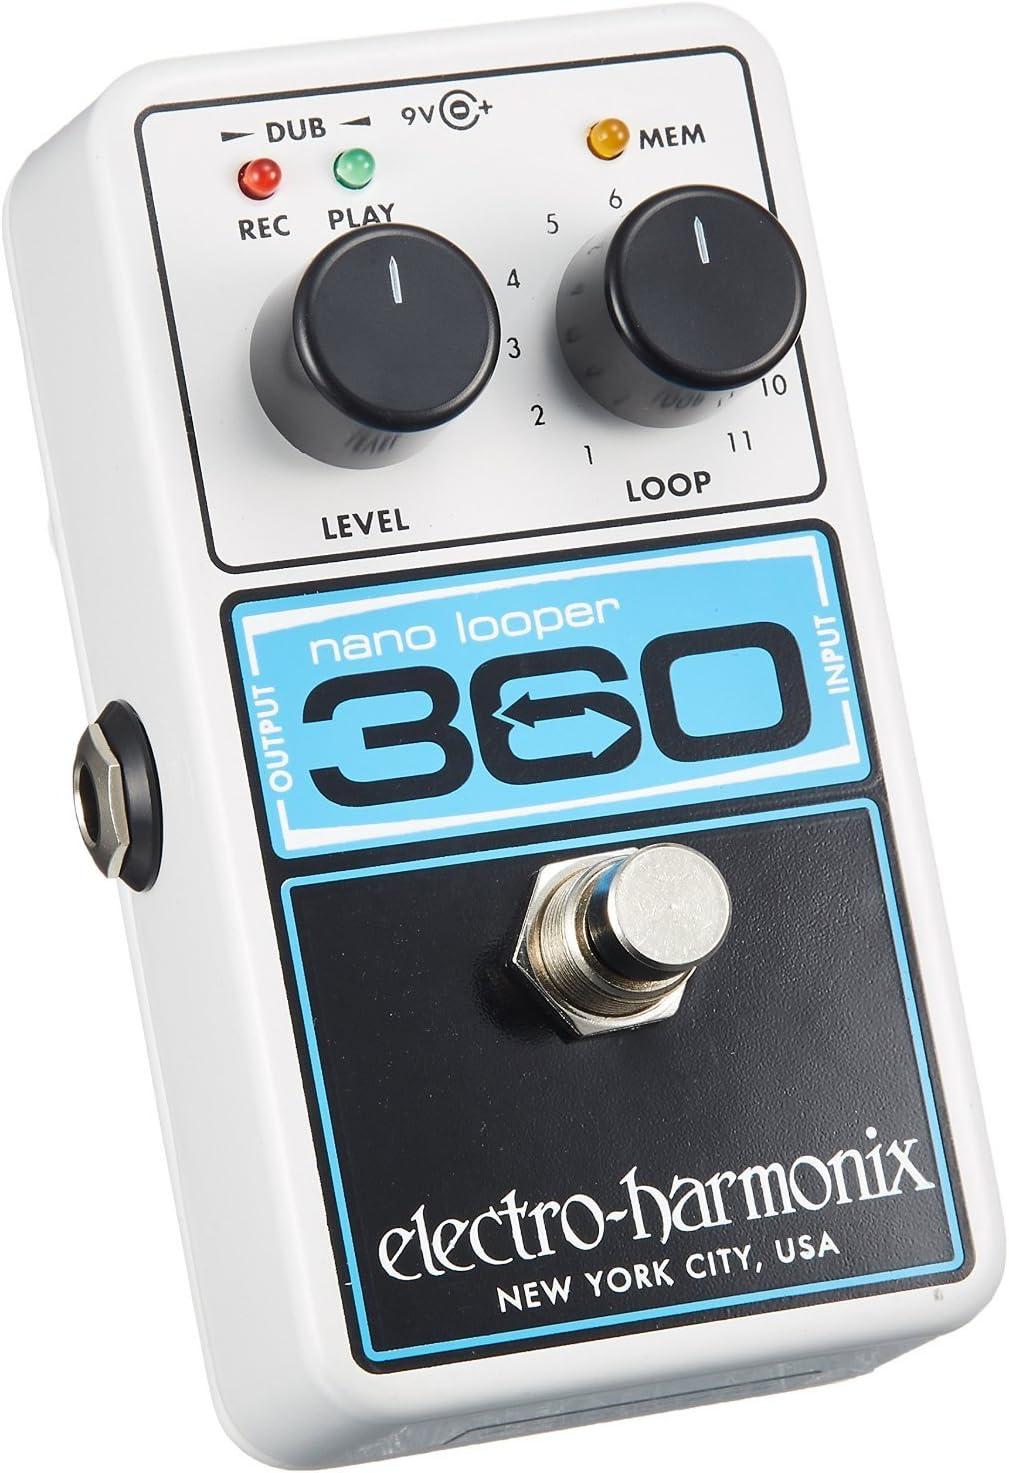 Used Electro-Harmonix EHX Nano Looper 360 Guitar Pedal!